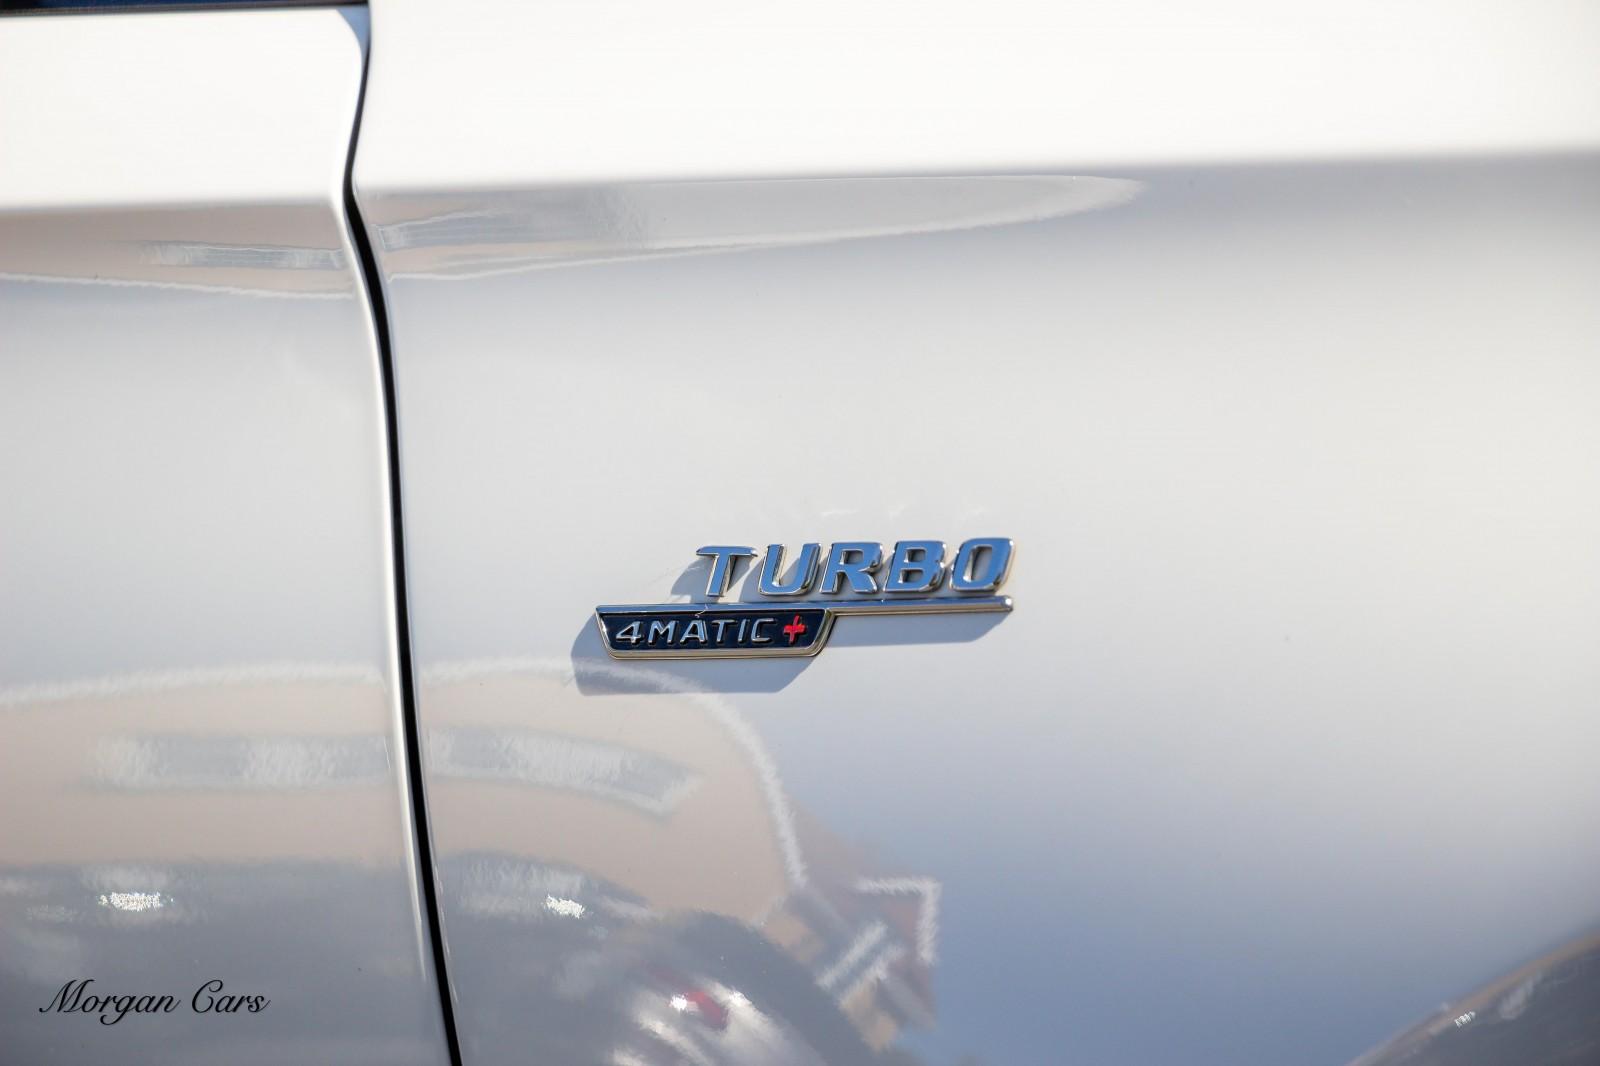 2020 Mercedes-Benz A Class AMG A 45 S 4MATICPLUS PLUS Petrol Automatic – Morgan Cars 9 Mound Road, Warrenpoint, Newry BT34 3LW, UK full